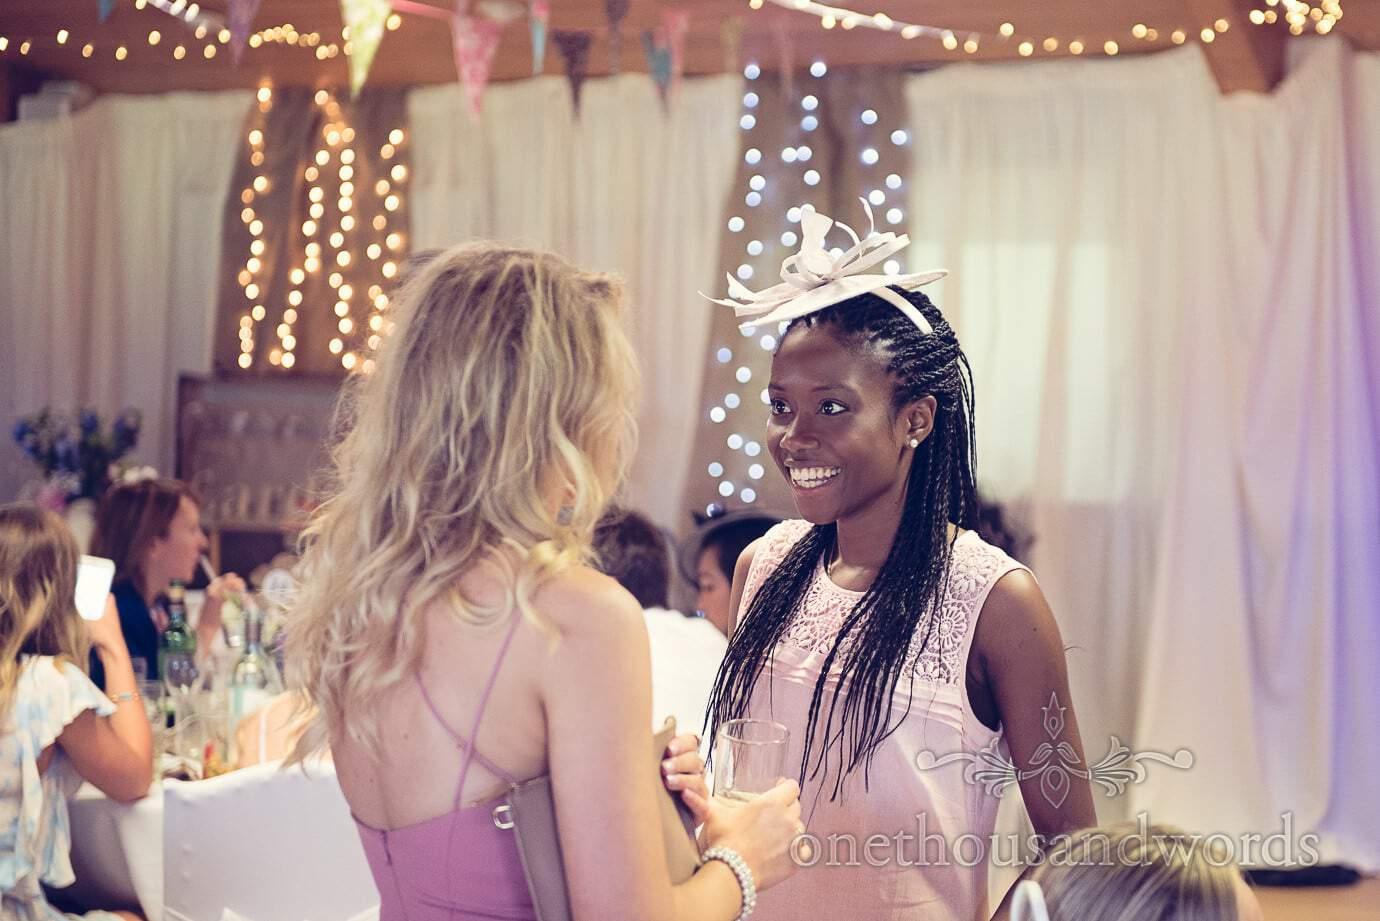 Wedding guest portrait in pink dress and fascinator under fairy lights